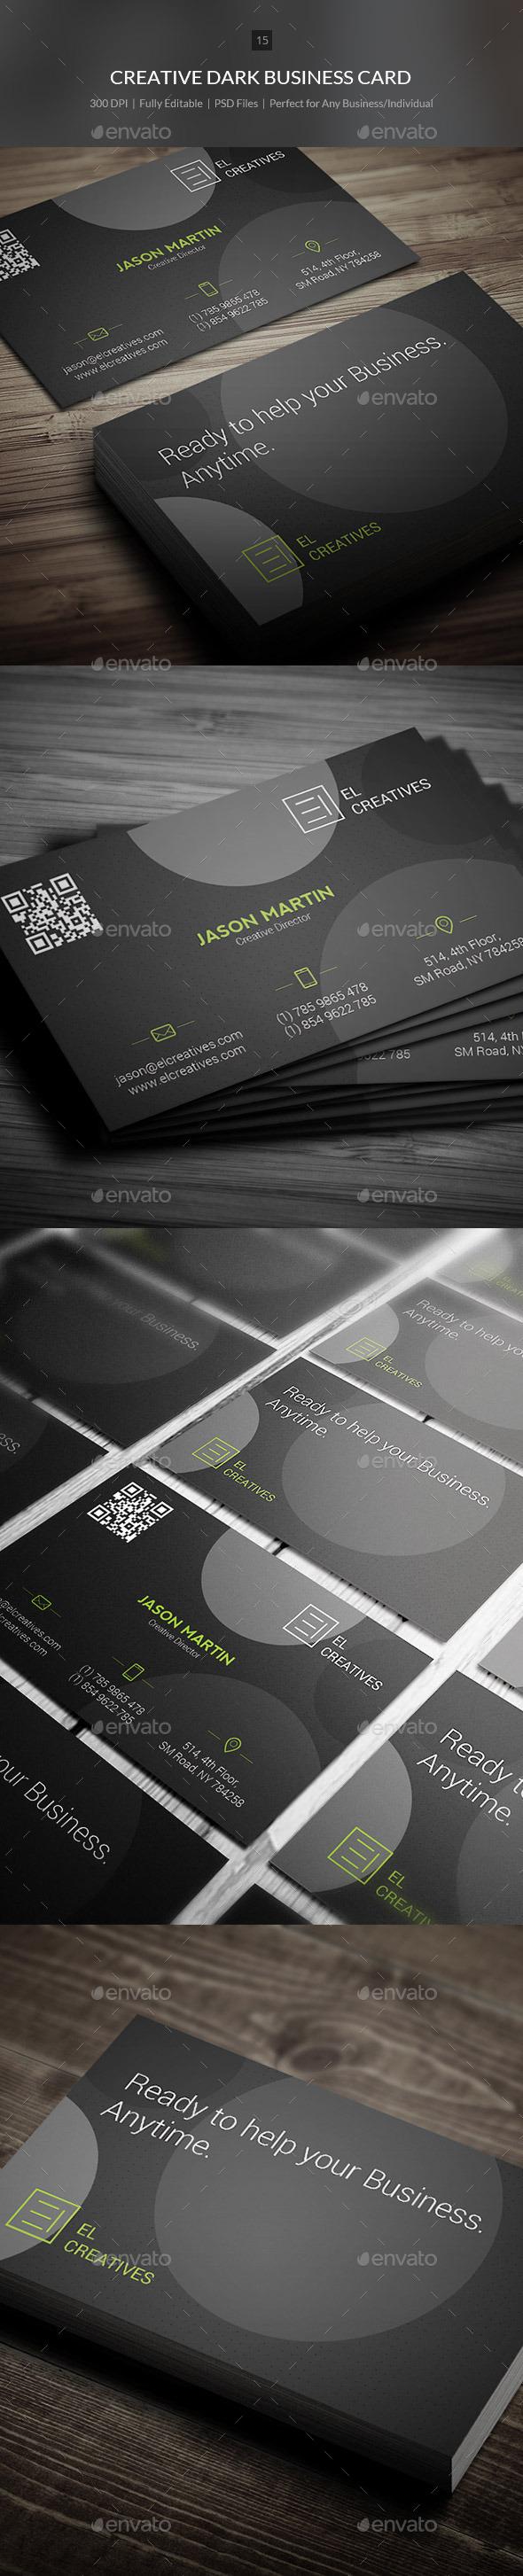 GraphicRiver Creative Dark Business Card 15 10803887